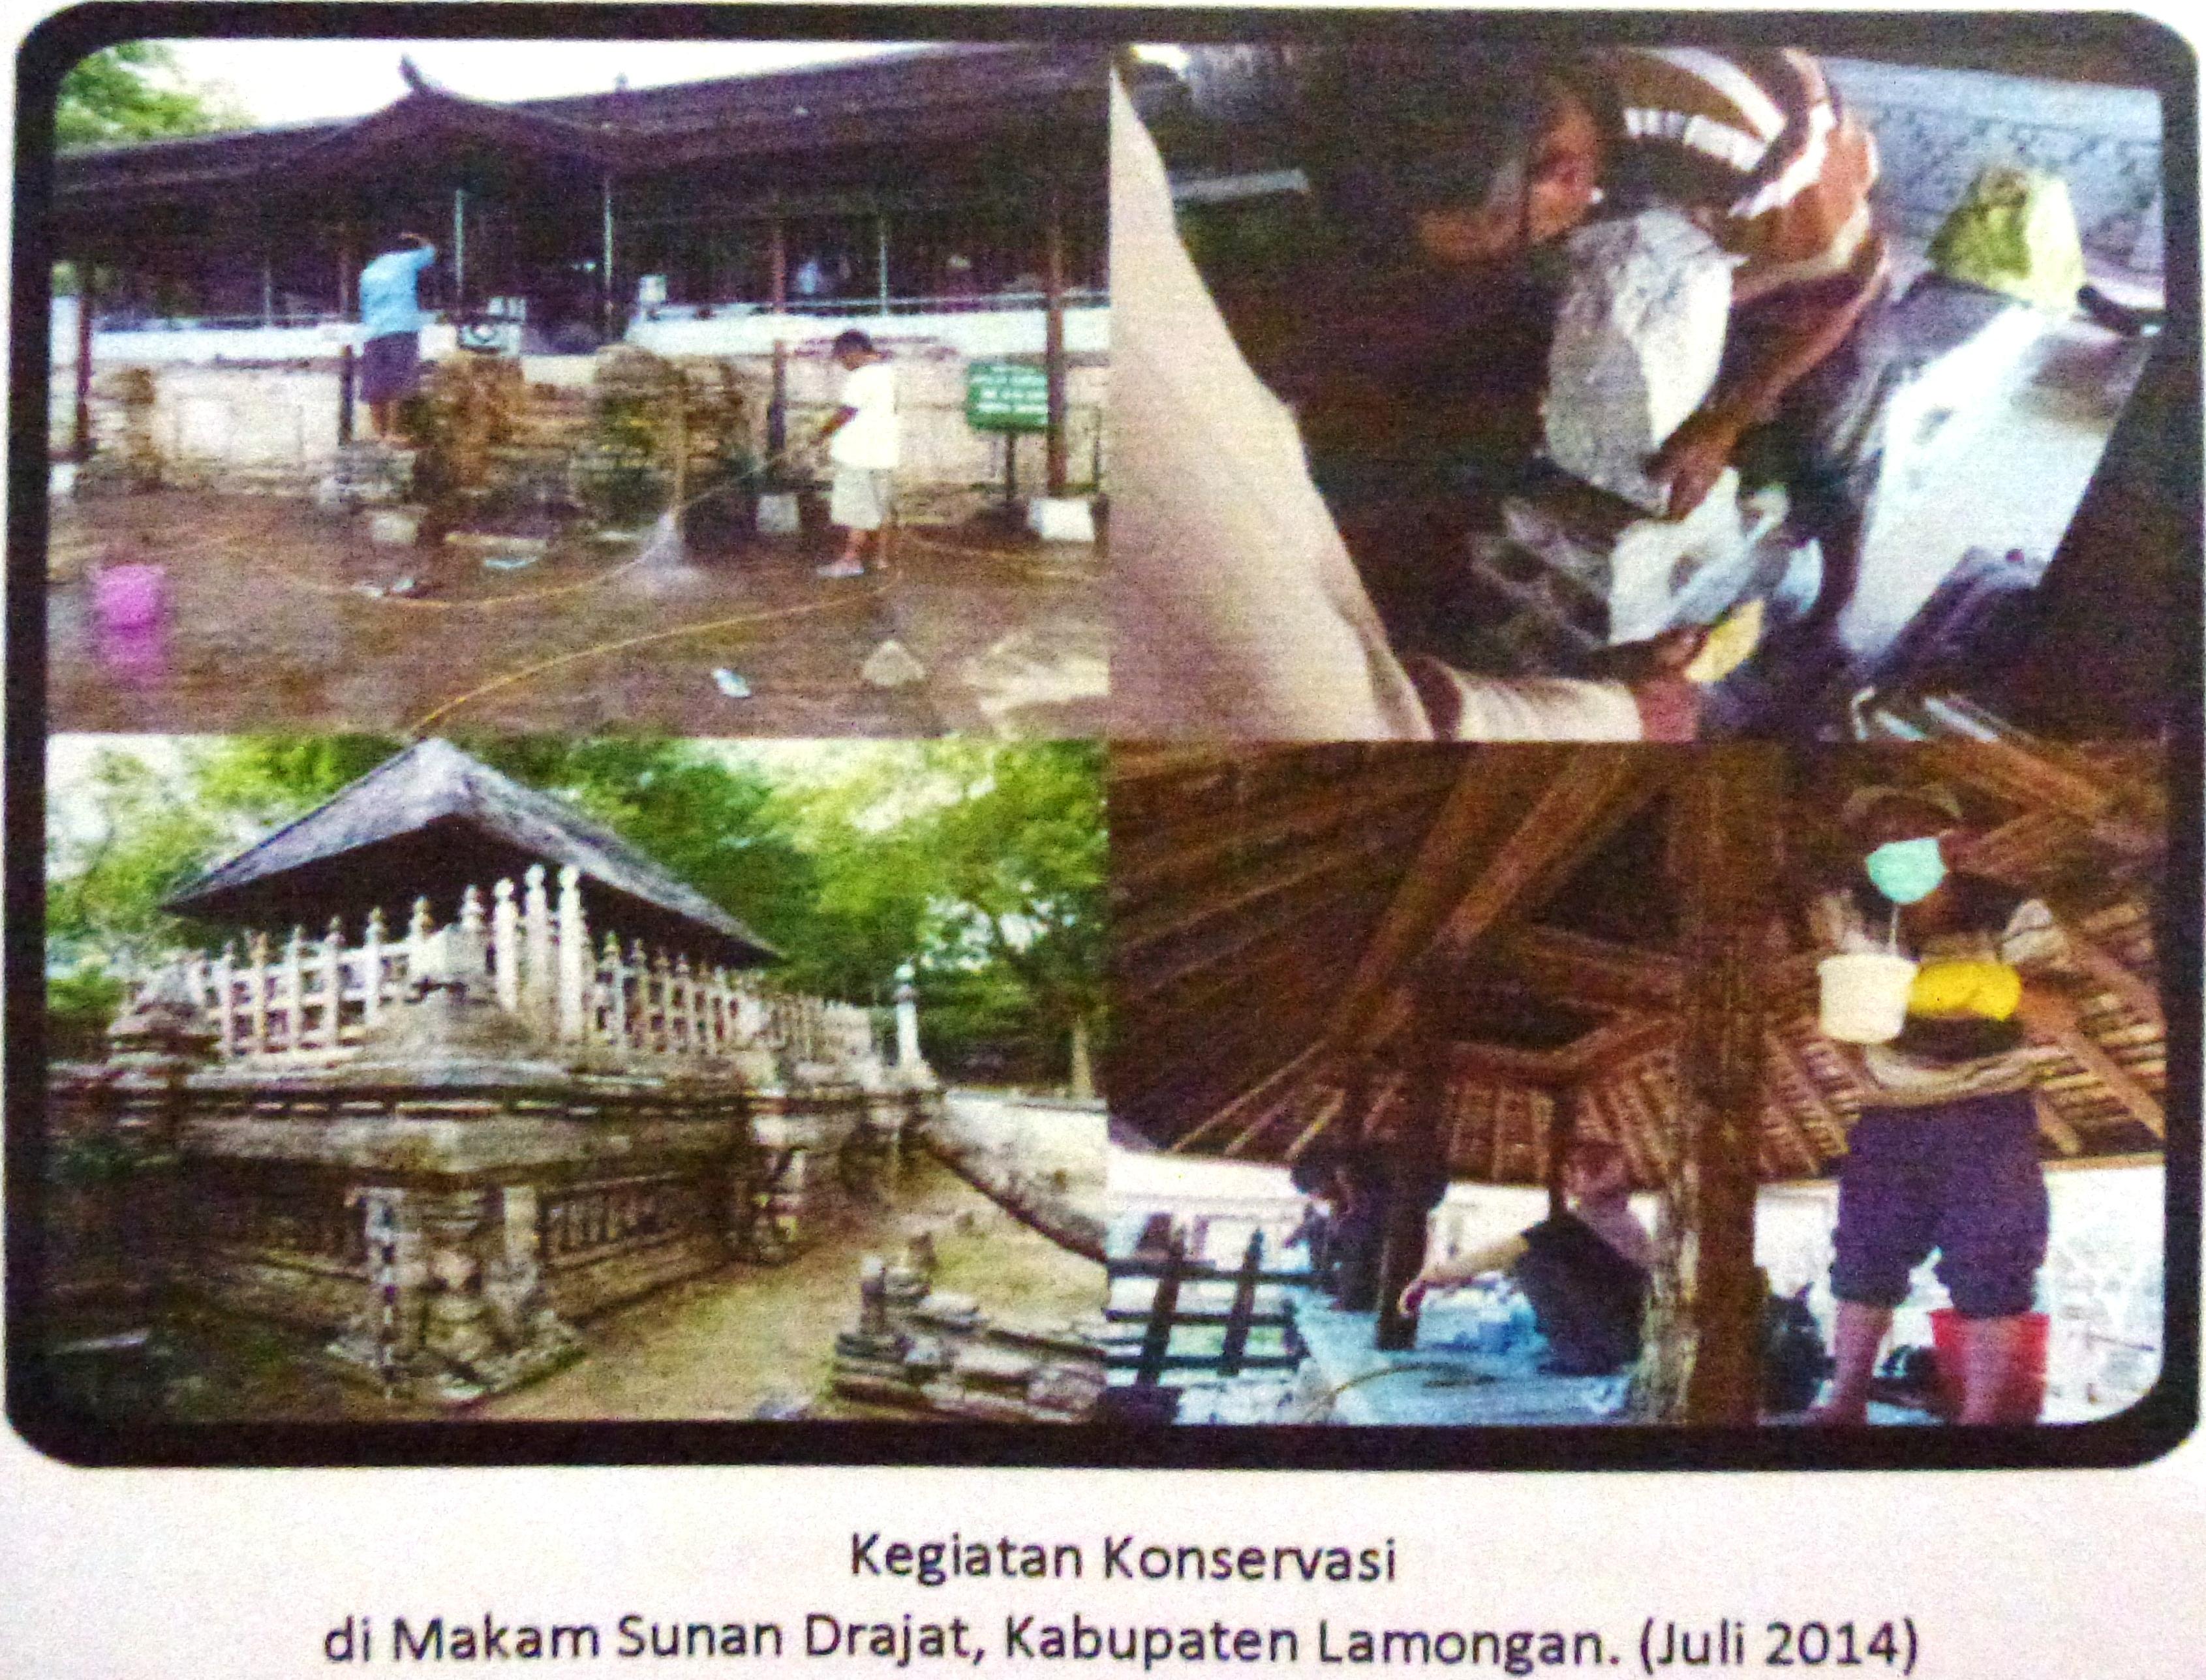 Kegiatan Bpcb Mojokerto Bulan Juli 2014 Balai Pelestarian Cagar Budaya